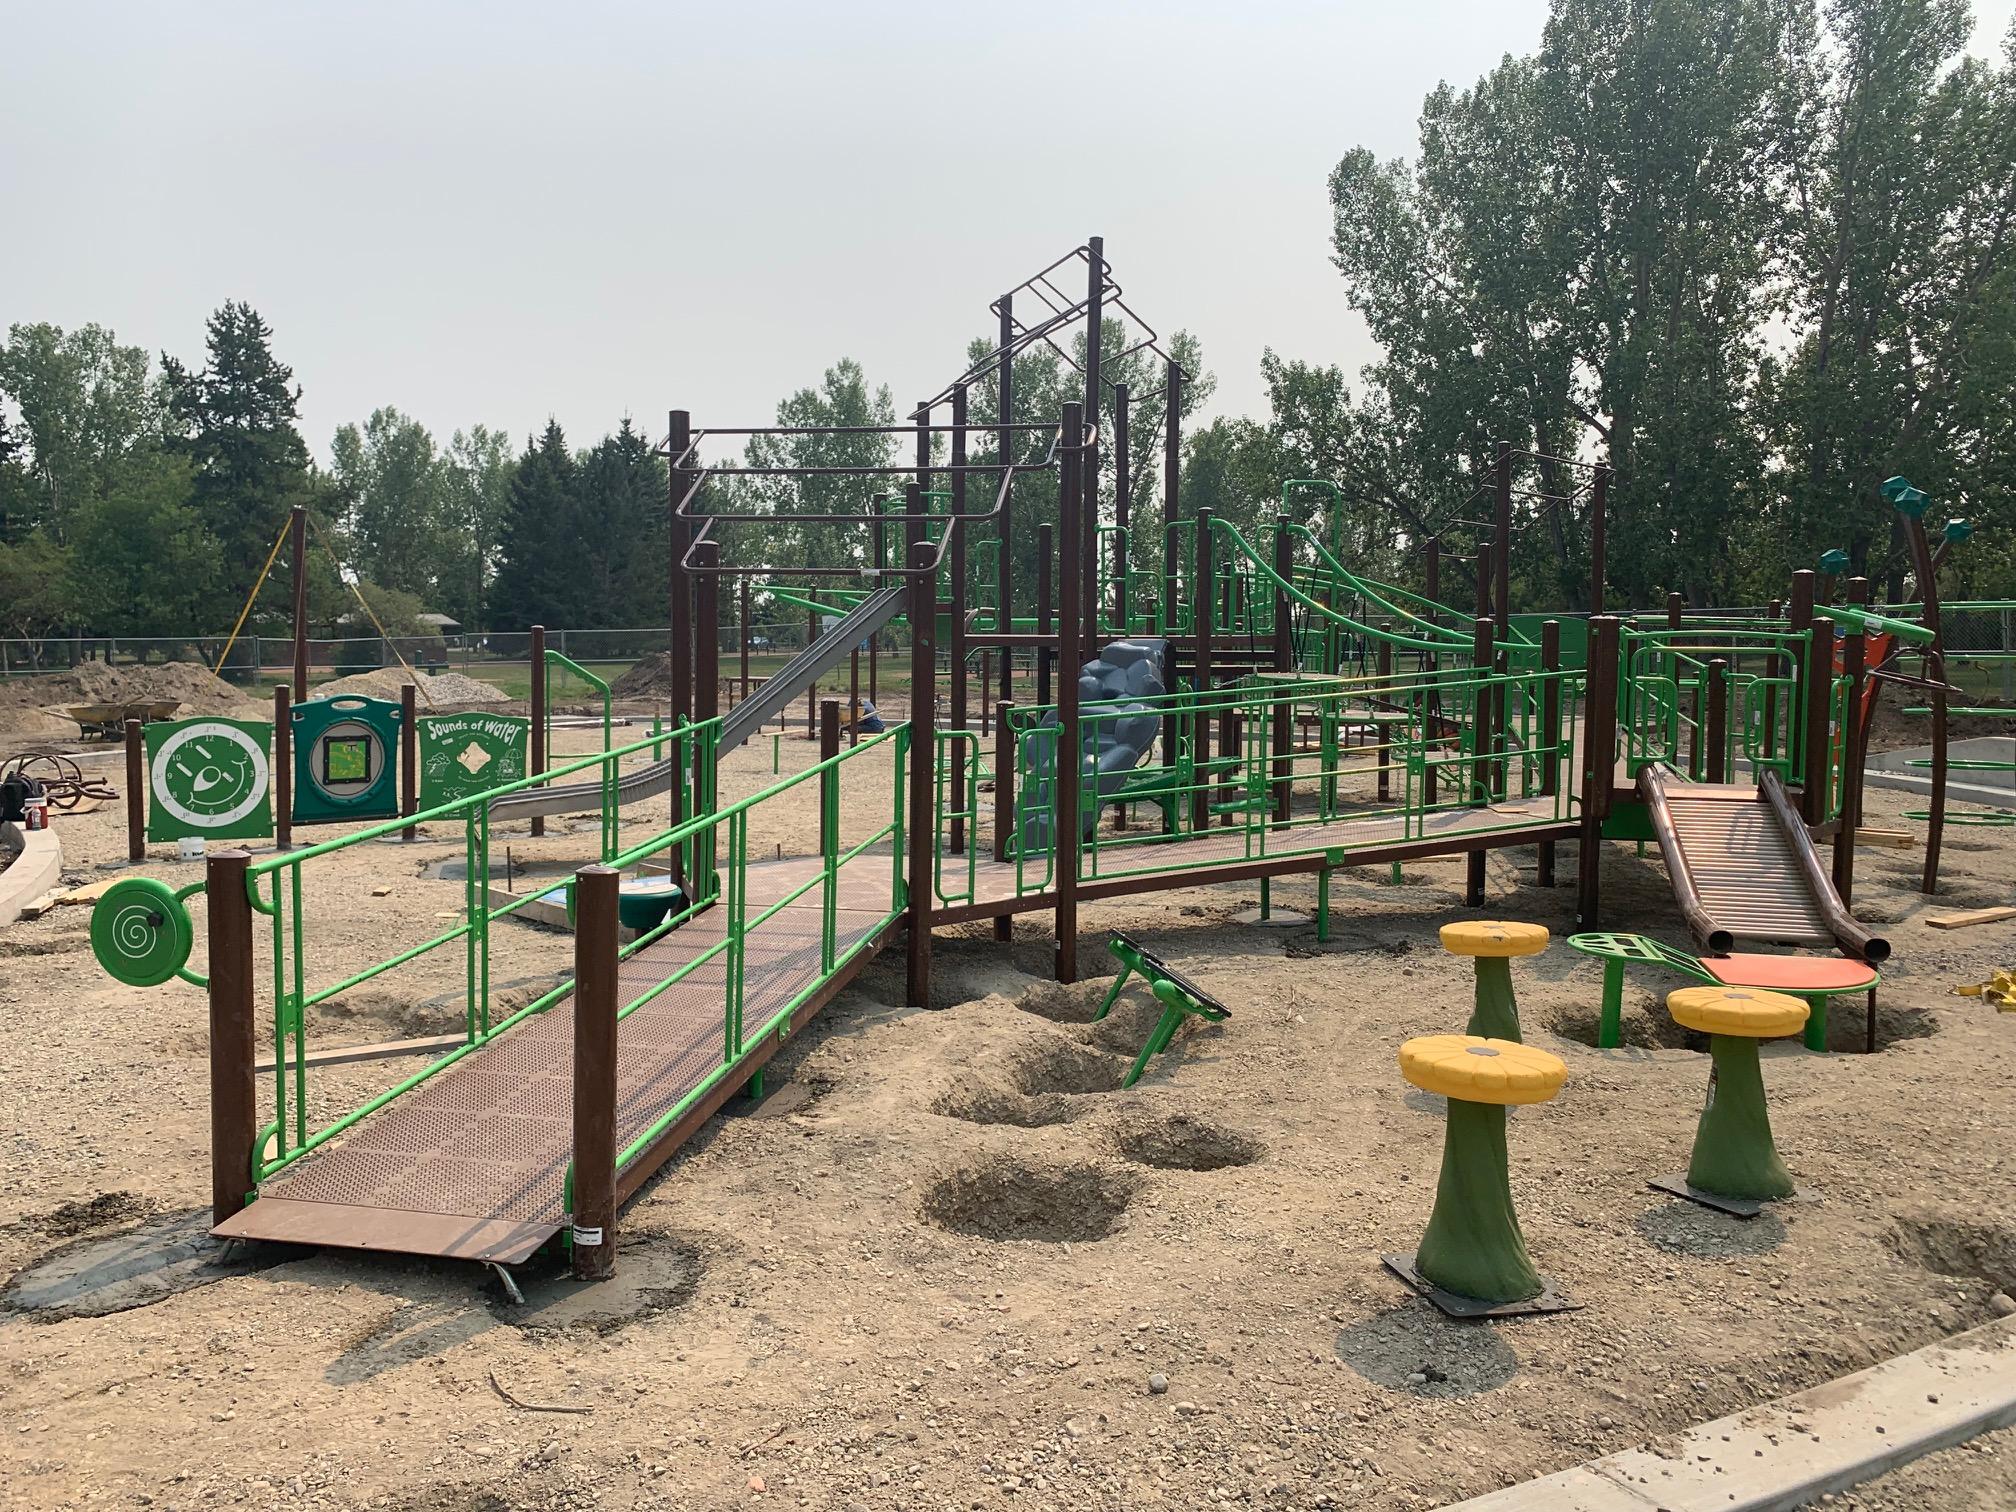 In Progress - North Glenmore Park (Calgary, AB)